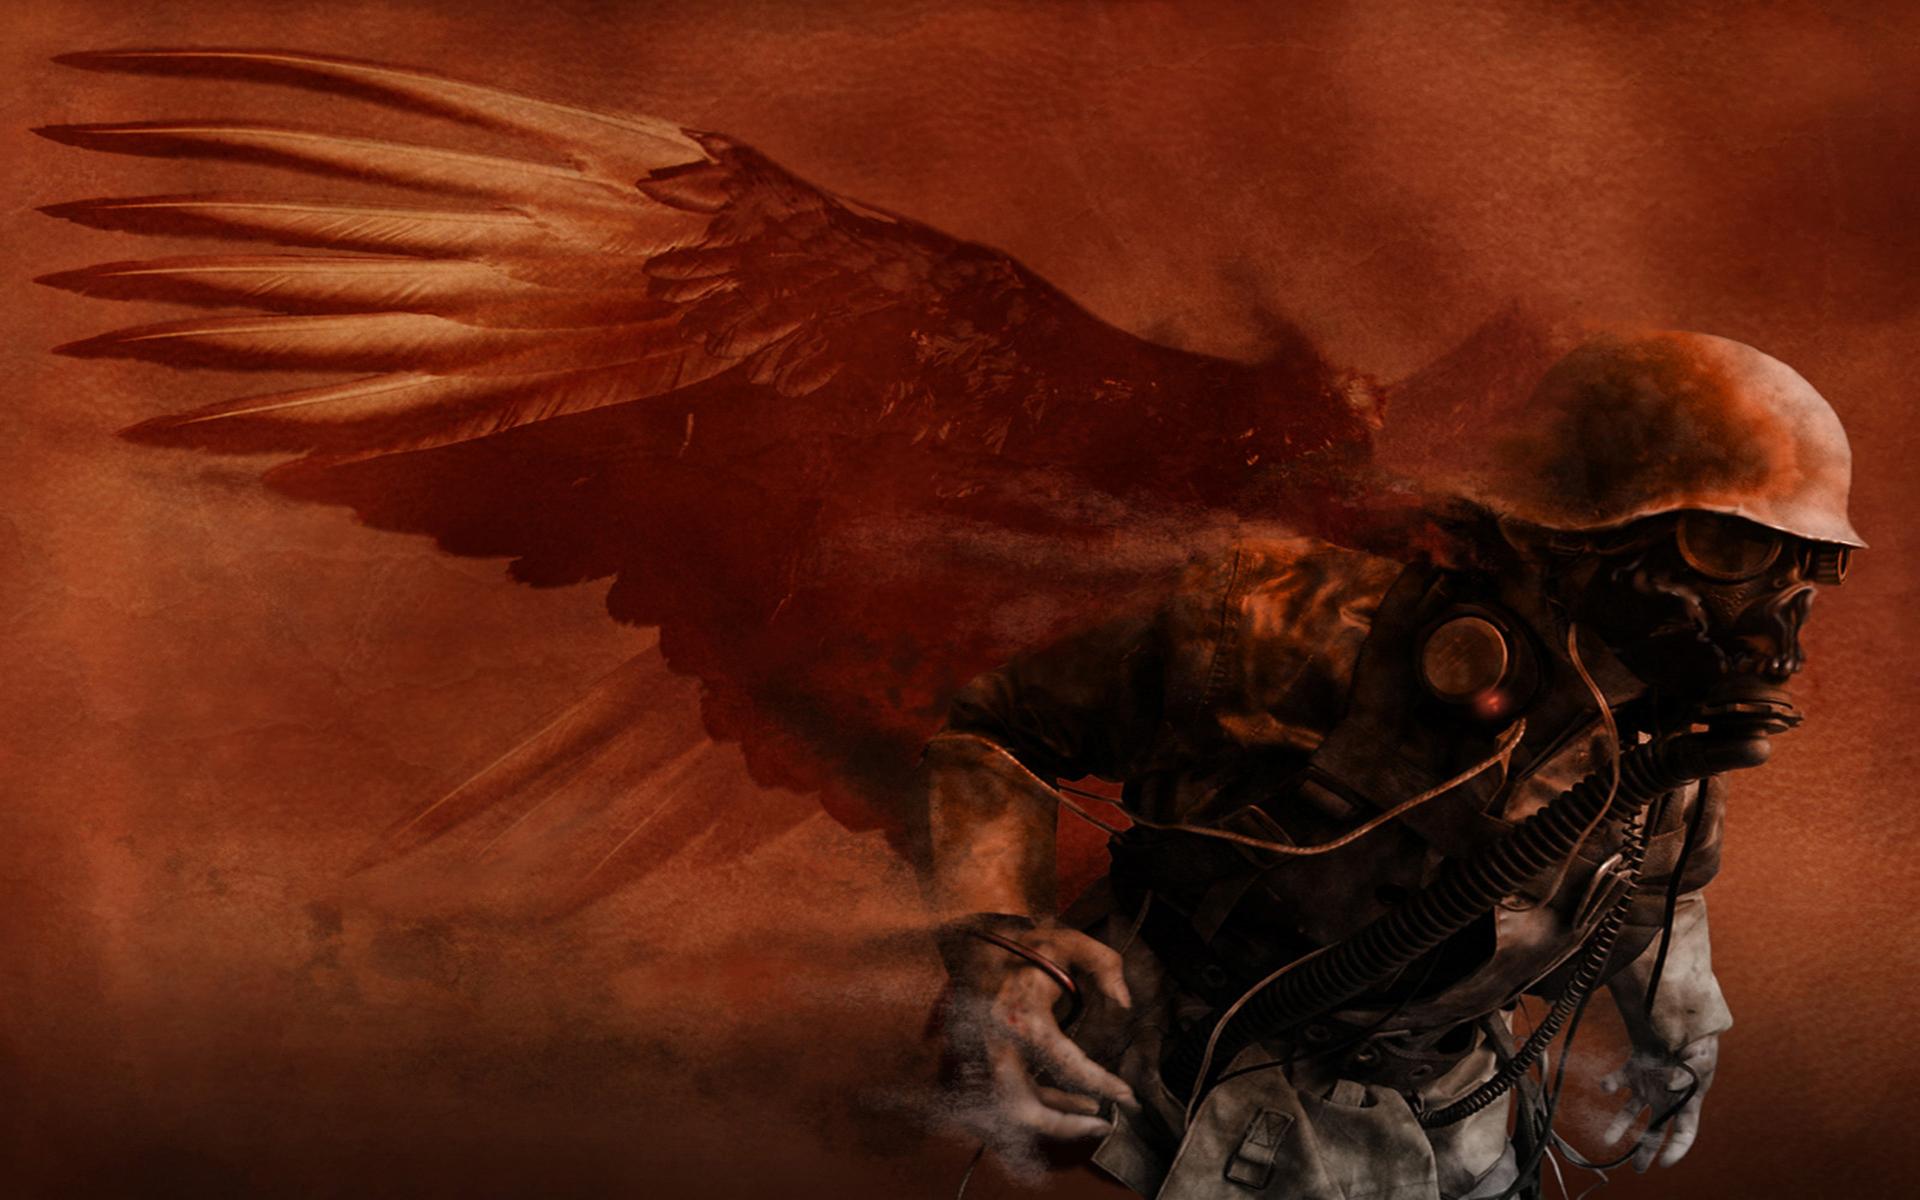 dark-angel-hd-wallpapers-11